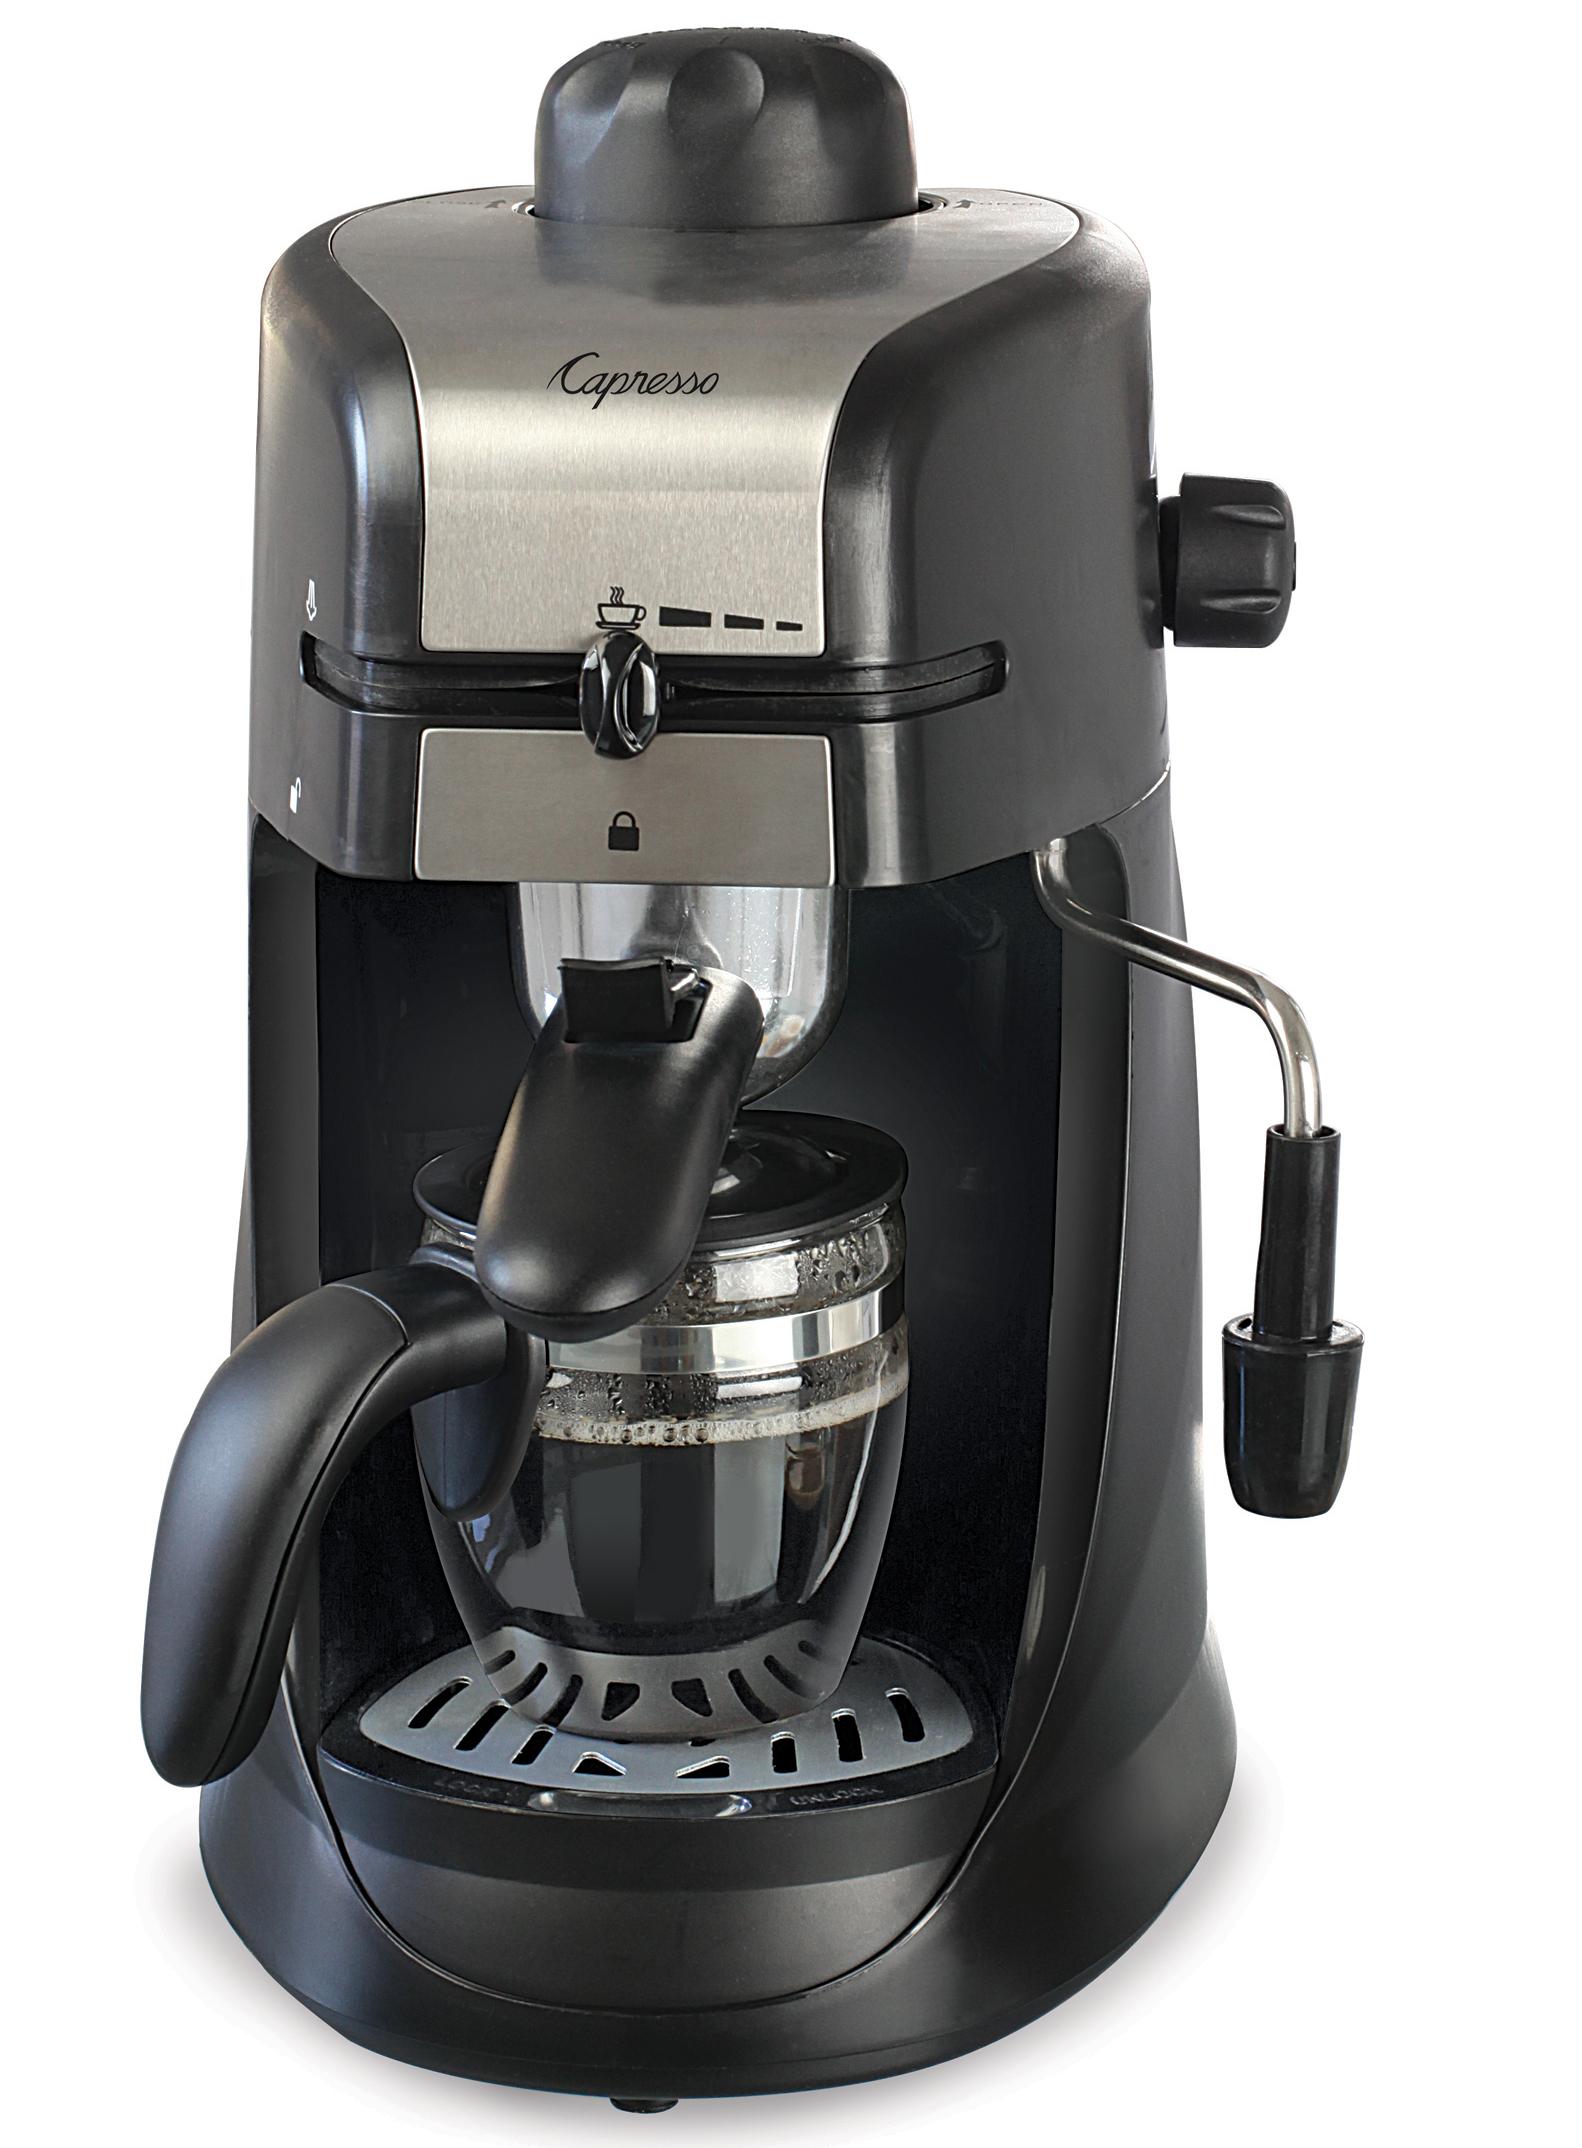 Cuisinart Coffee Maker Heating Element Not Working : Capresso 4-Cup Espresso Cappuccino Machine 2014